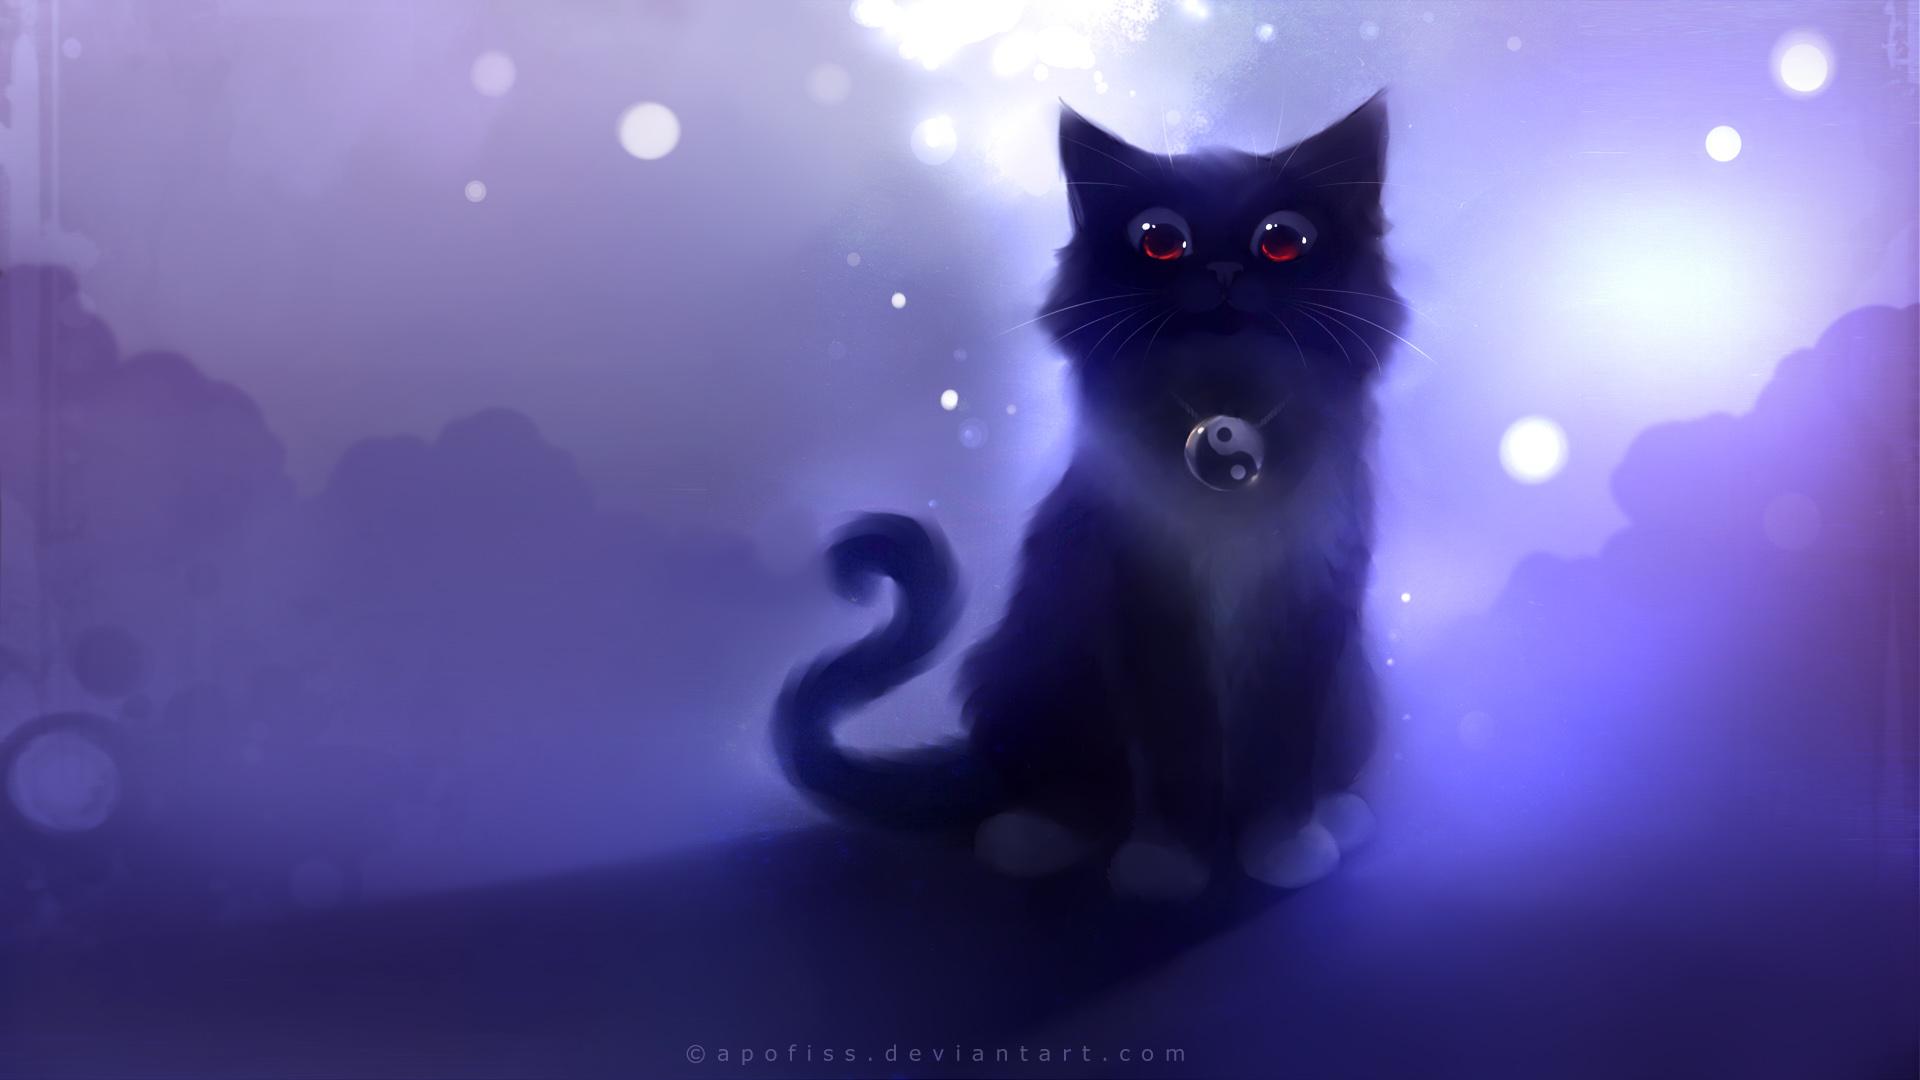 Drawn wallpaper cute anime cat « Apofiss Drawing Black Image